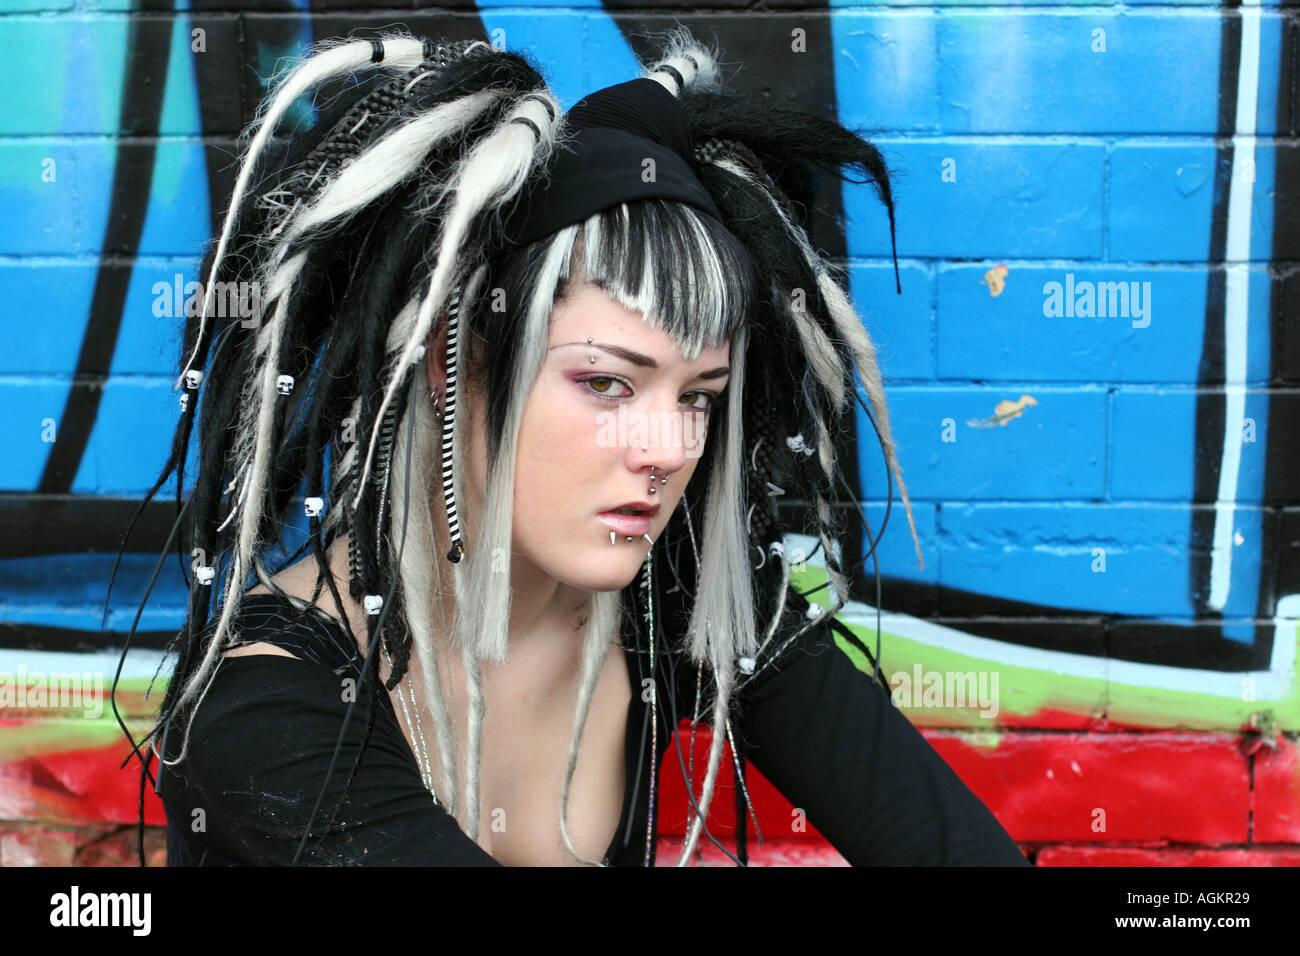 gothic girl posing in grafitti wall - Stock Image